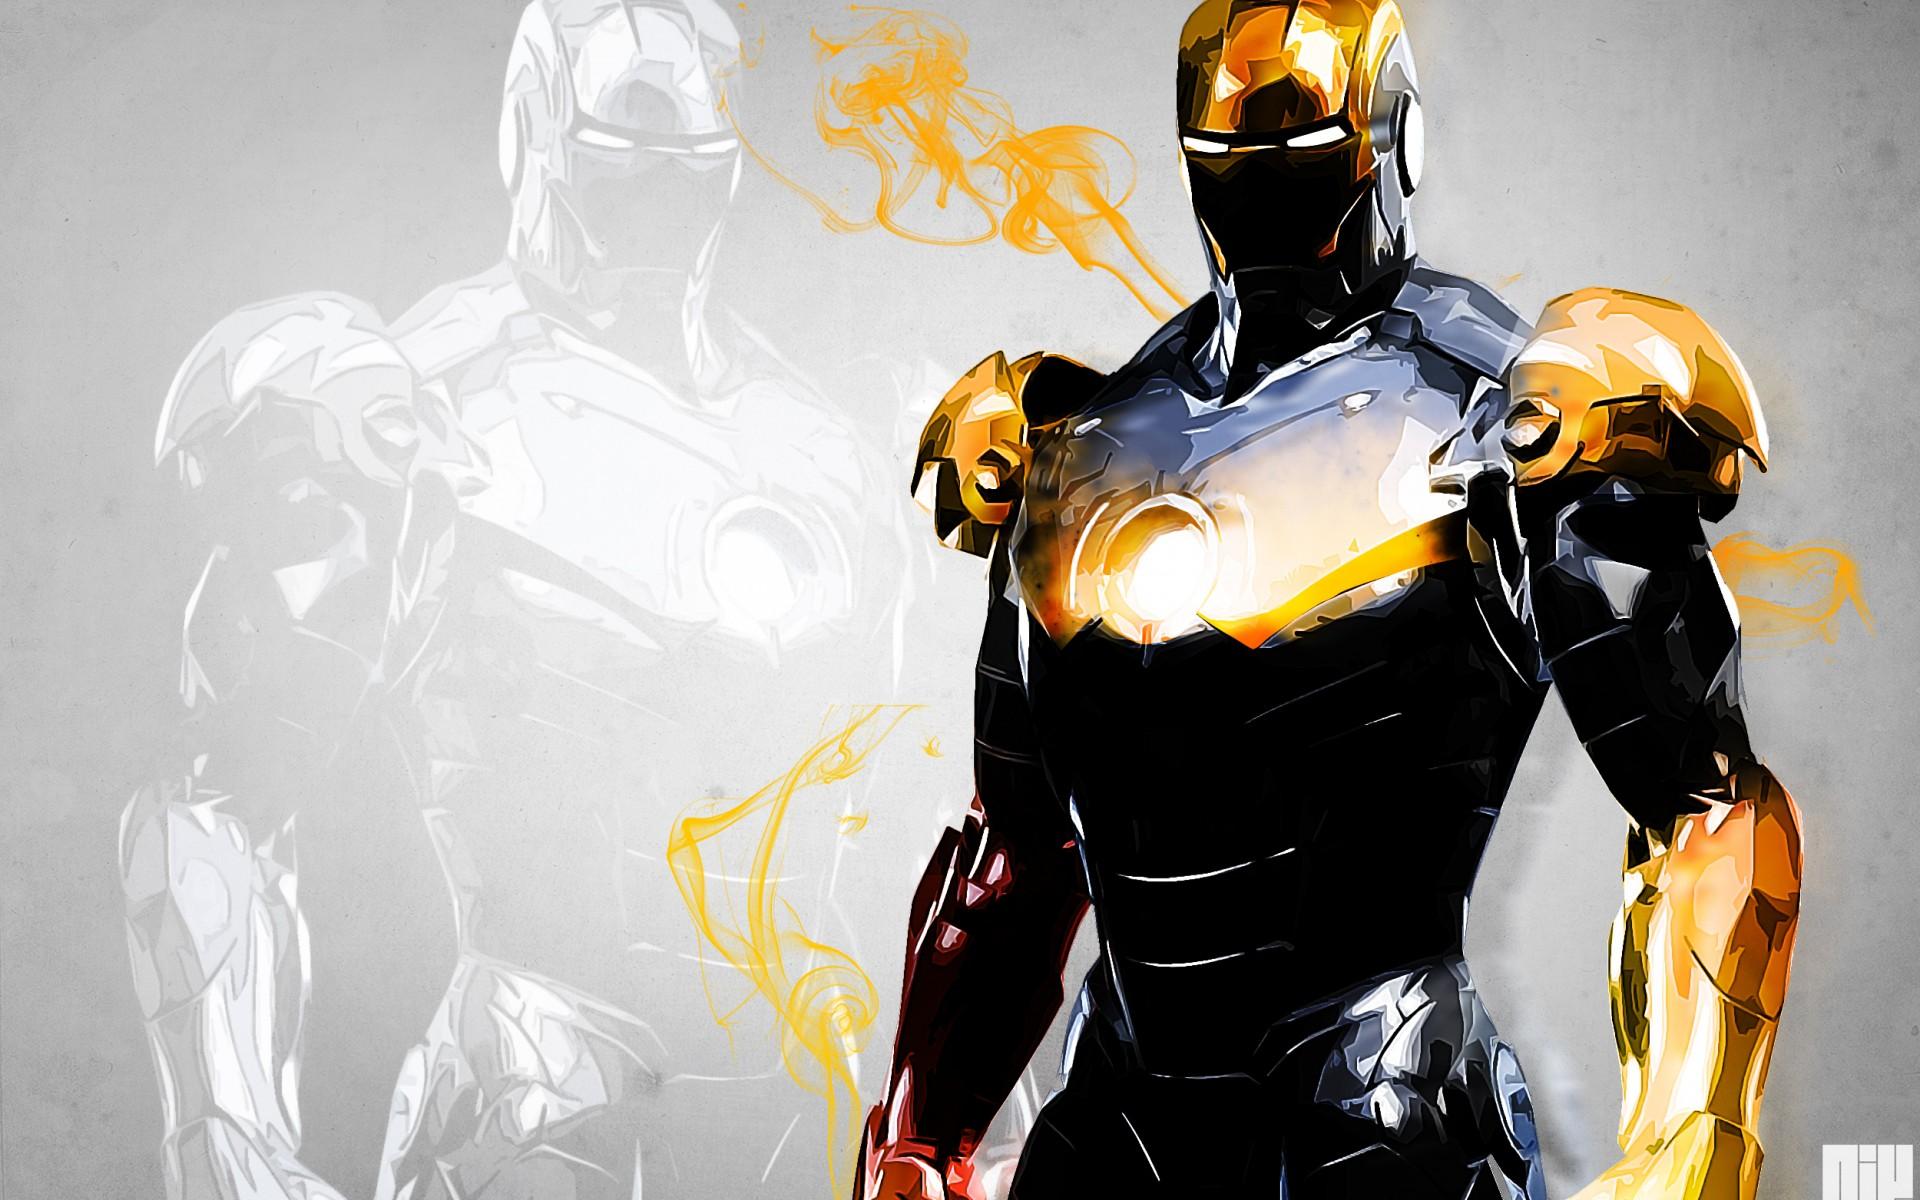 44 superhero wallpaper hd on wallpapersafari - Iron man cartoon hd ...